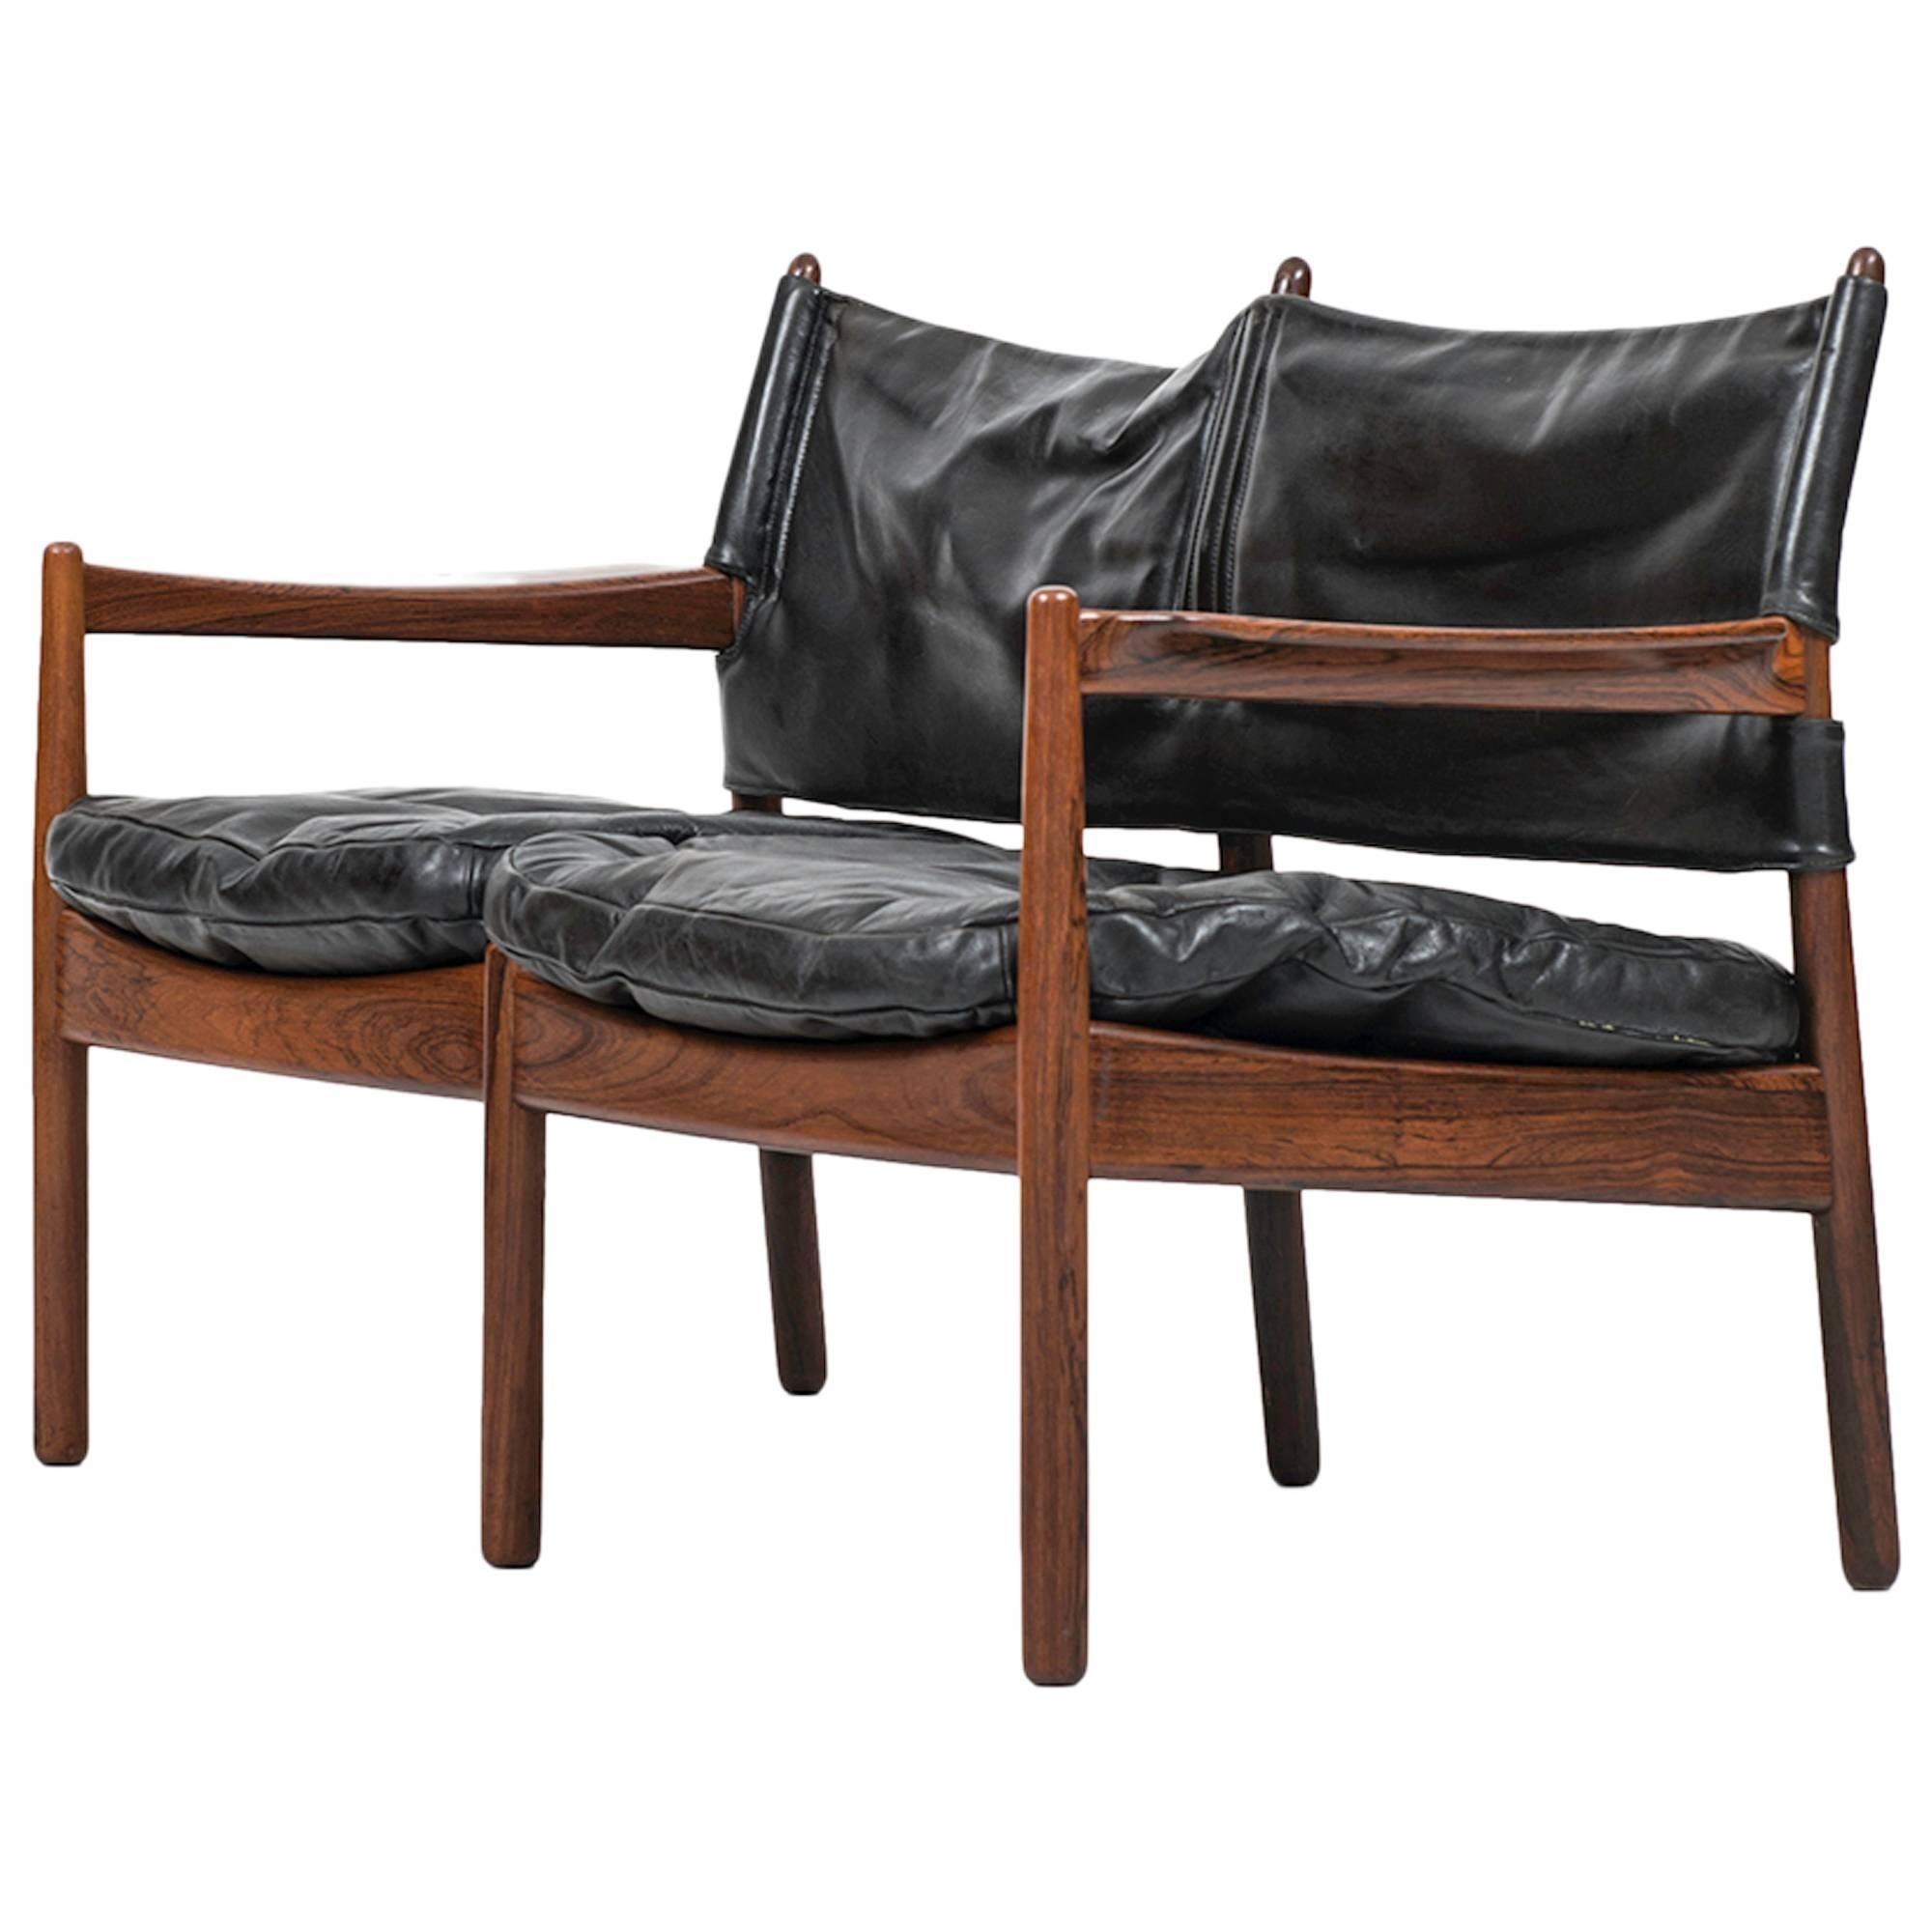 Gunnar Myrstrand Two-Seat Sofa by Källemo in Sweden